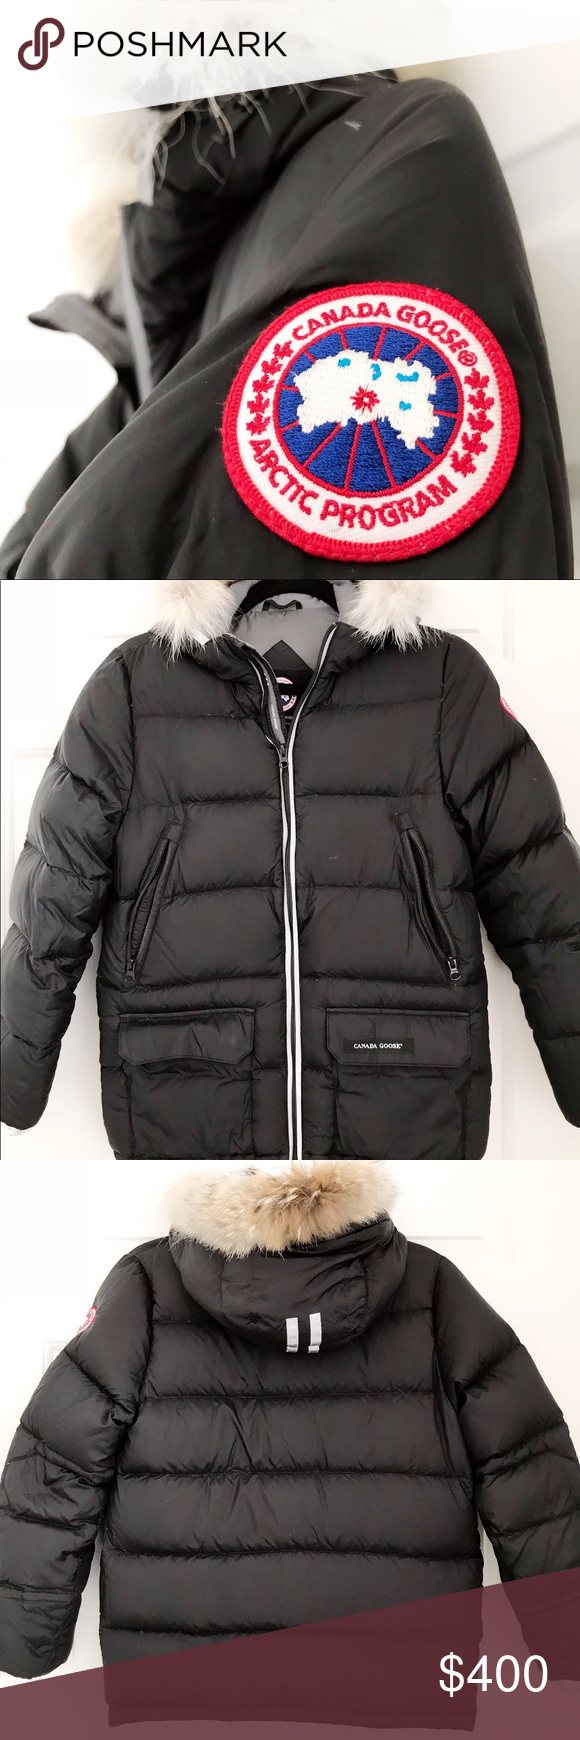 67e373a855907 Canada Goose Black Jacket AUTHENTIC Canada Goose Oliver jacket in black.  Size  Big Kids